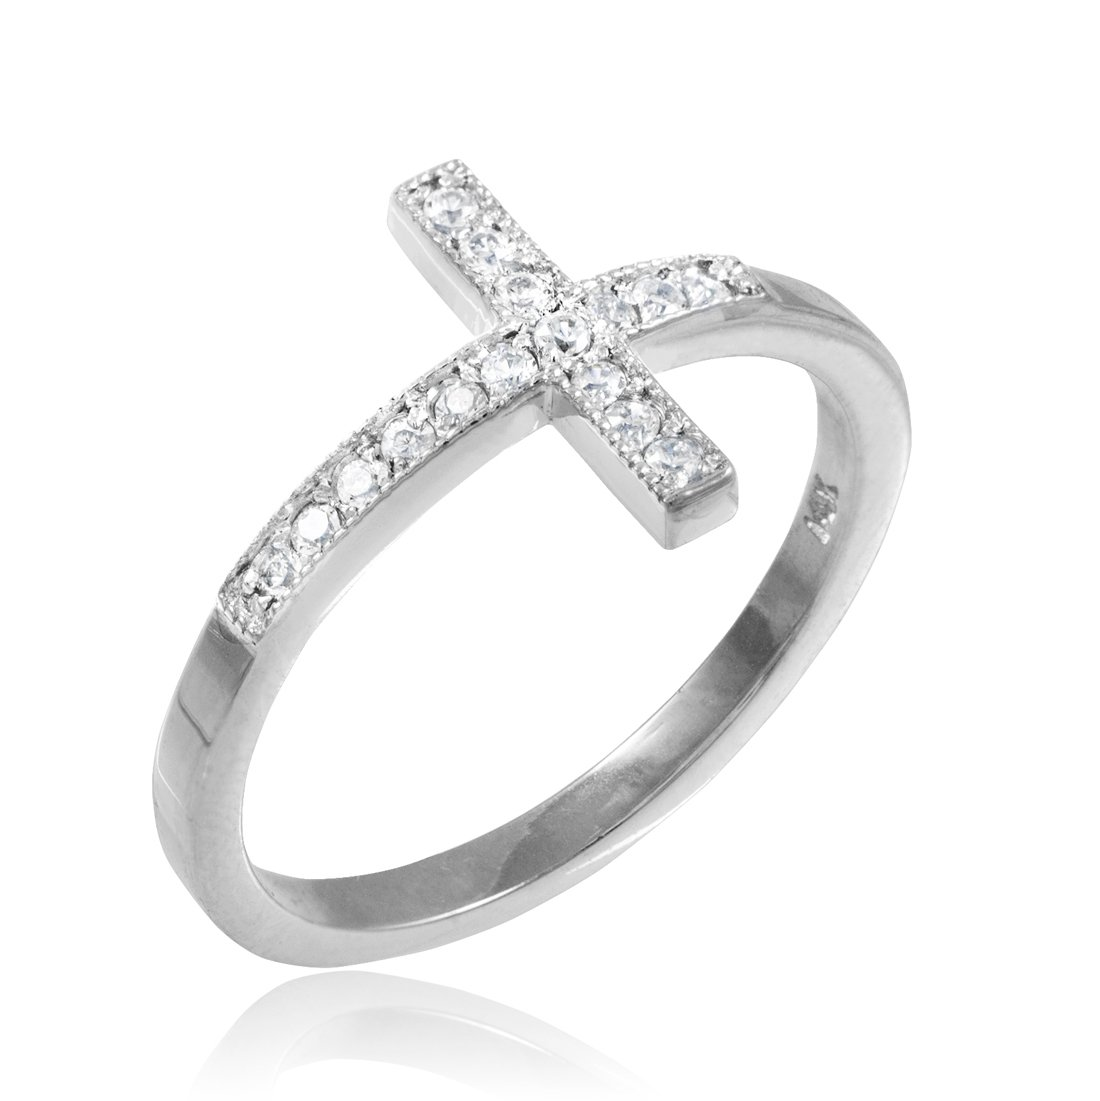 10k White Gold Sideways Cross Ring with Diamonds (8.5)